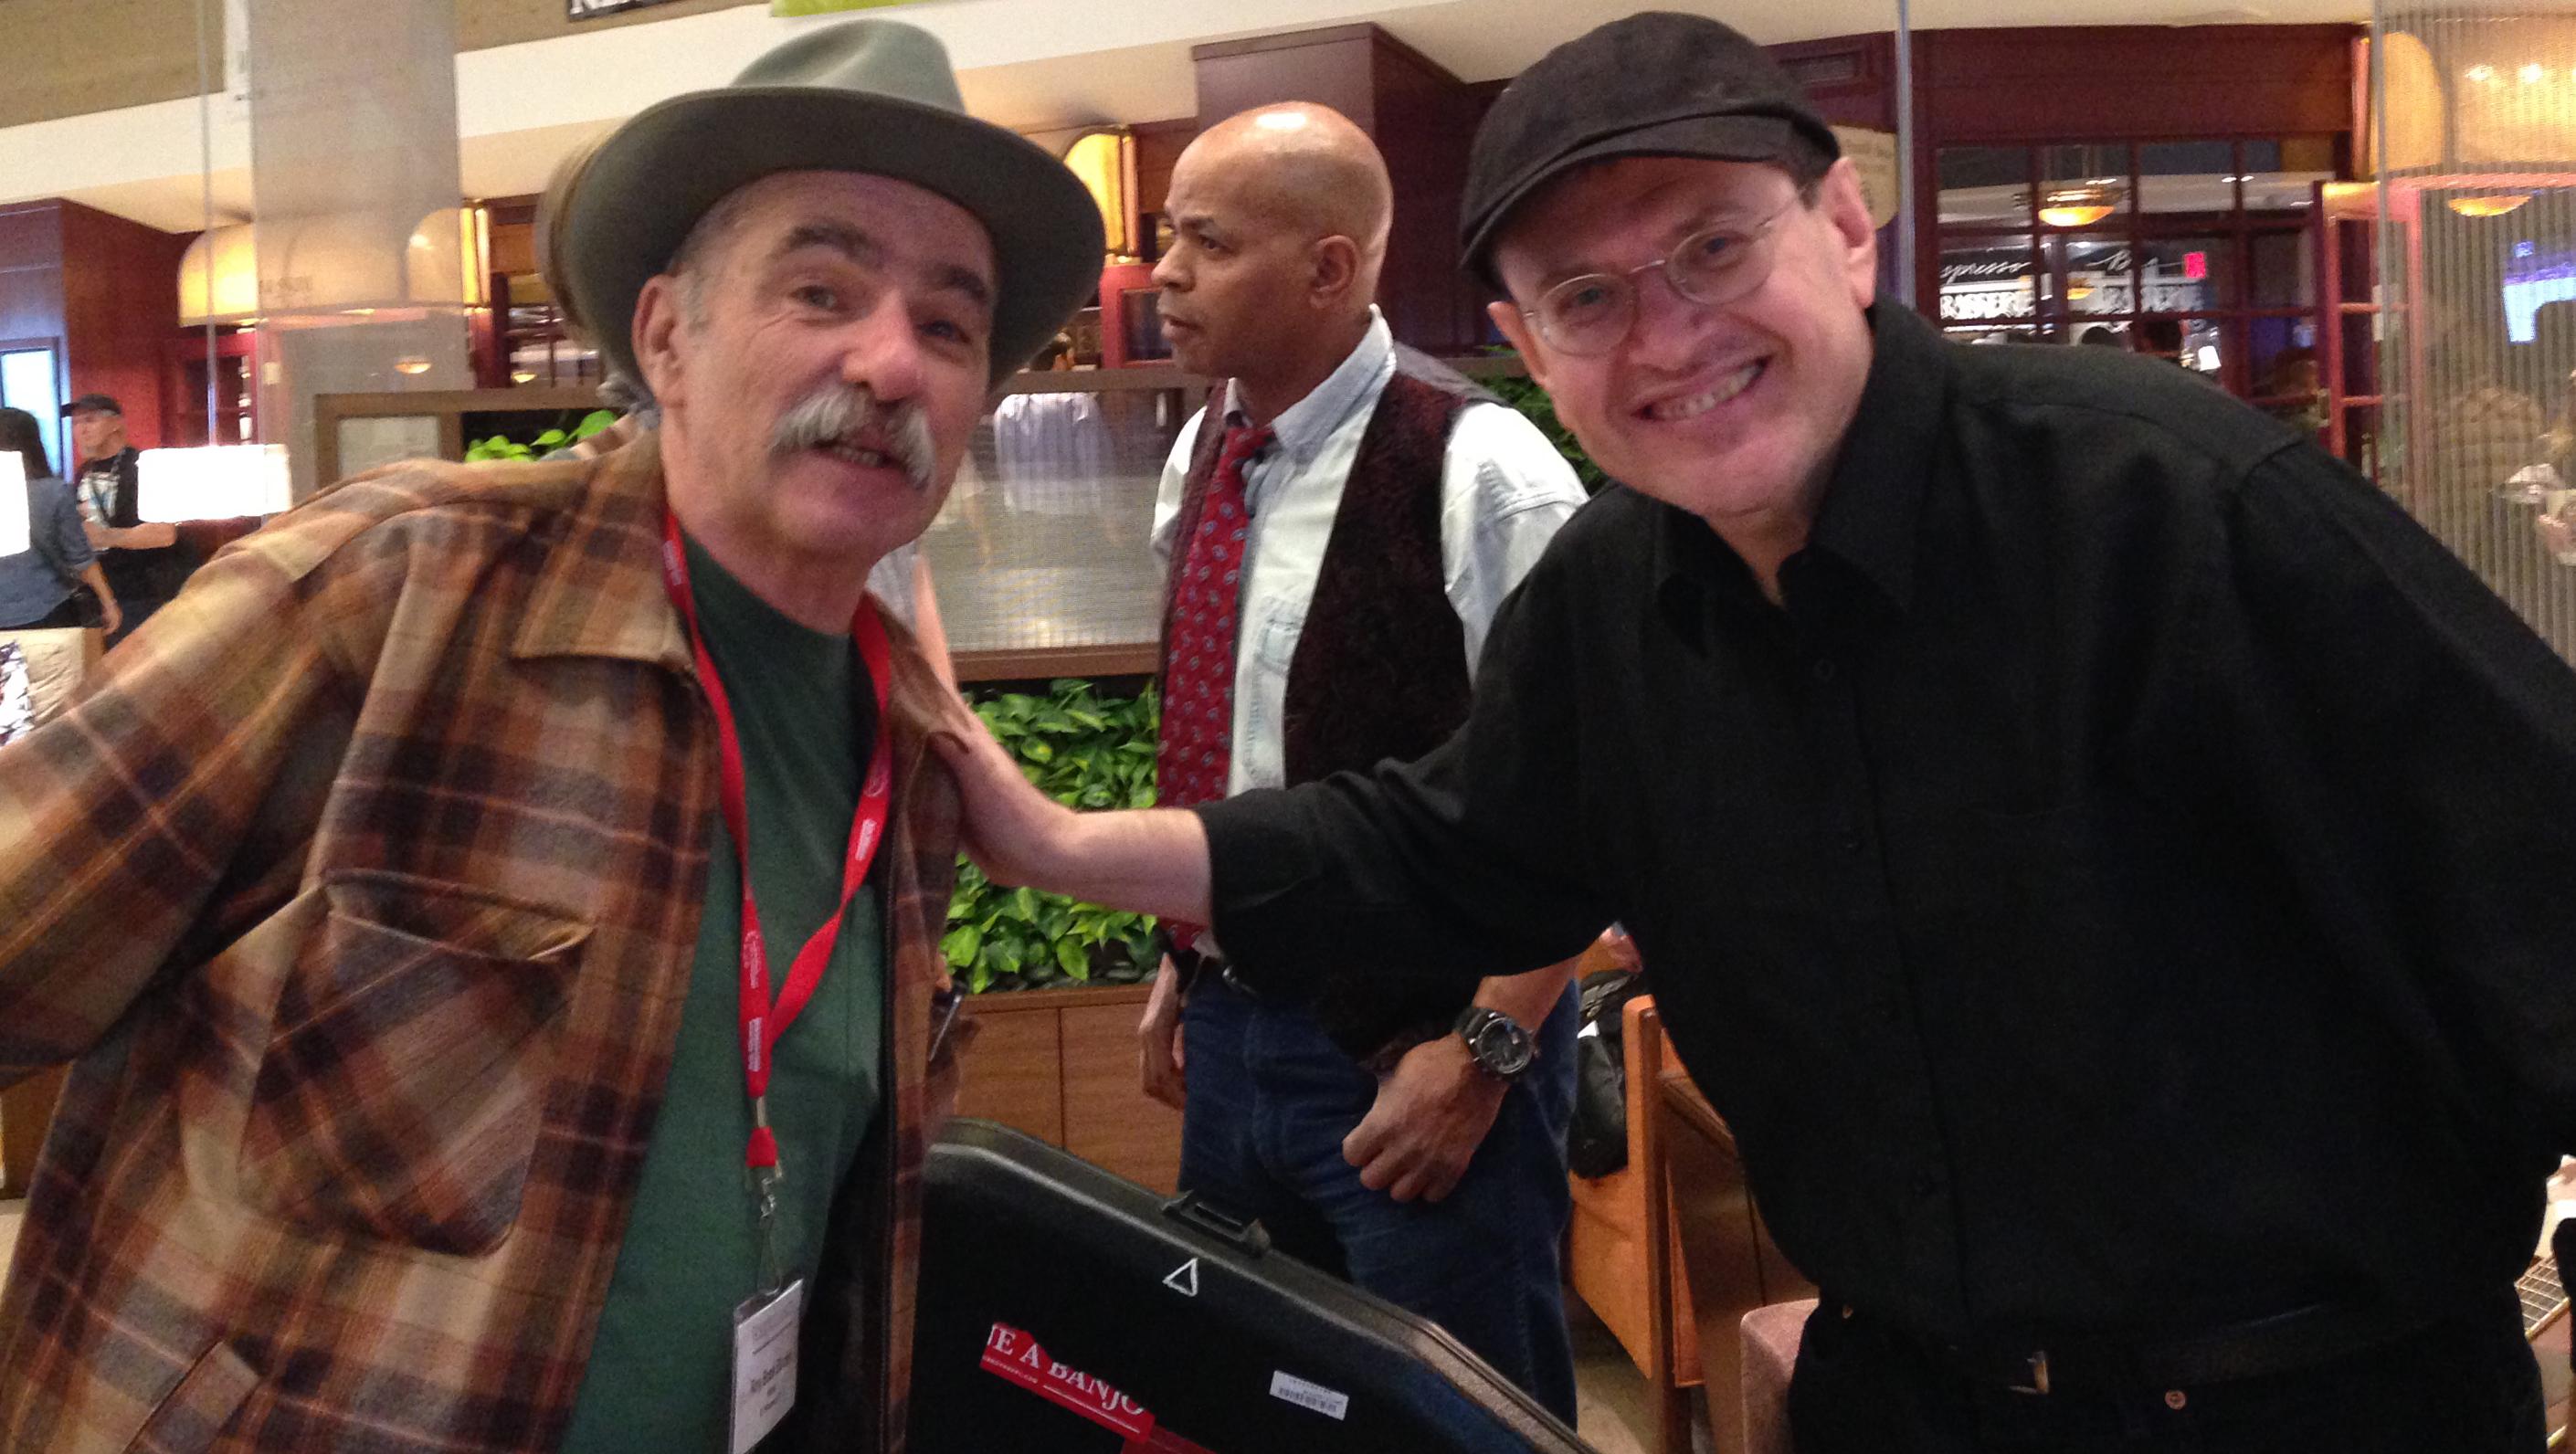 Roy Book Binder & Fabrizio Poggi